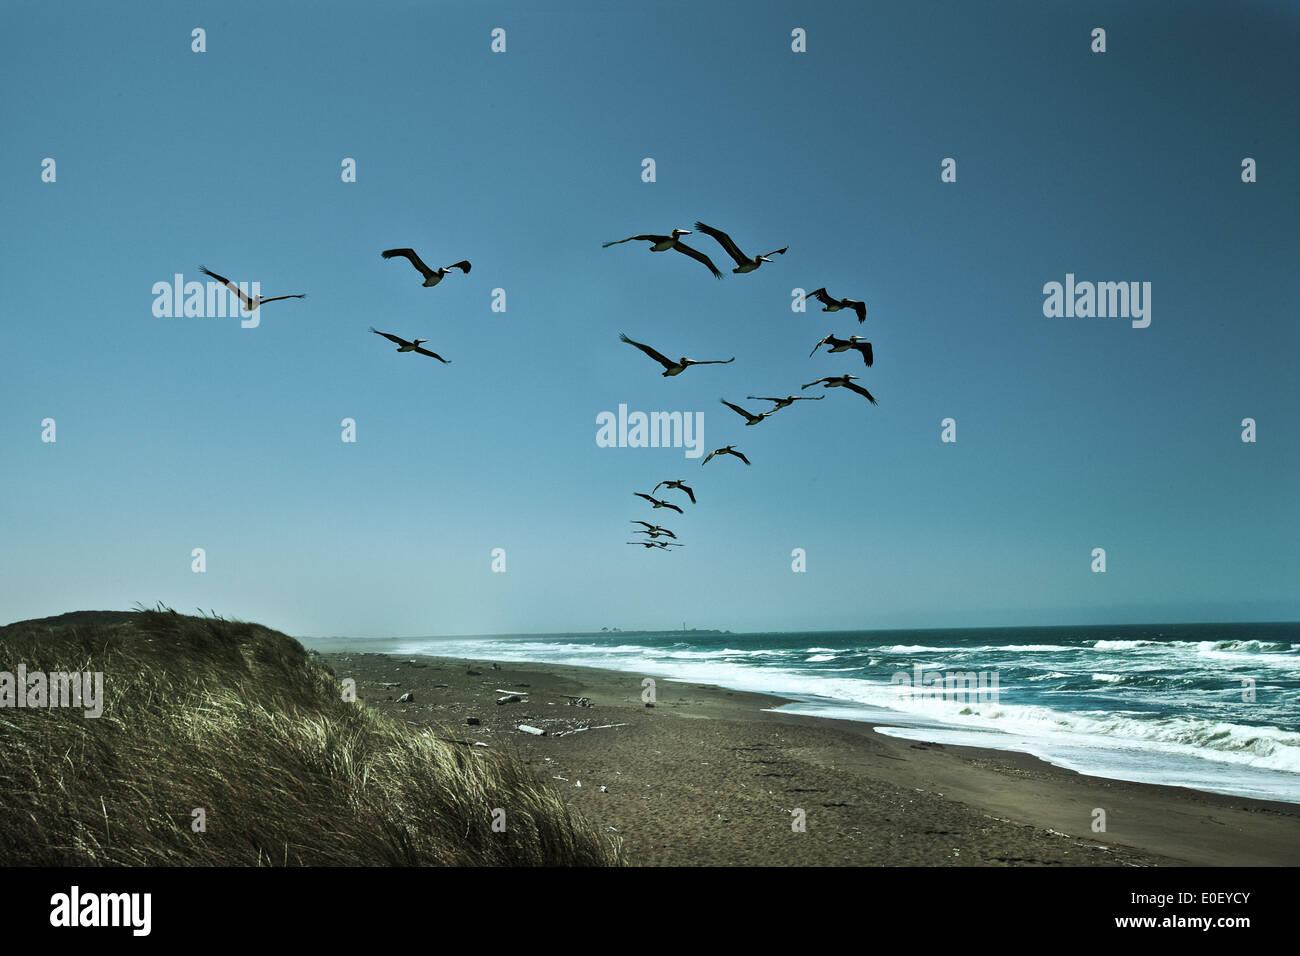 Geschwader der Pelikane im Flug über Strand Stockbild